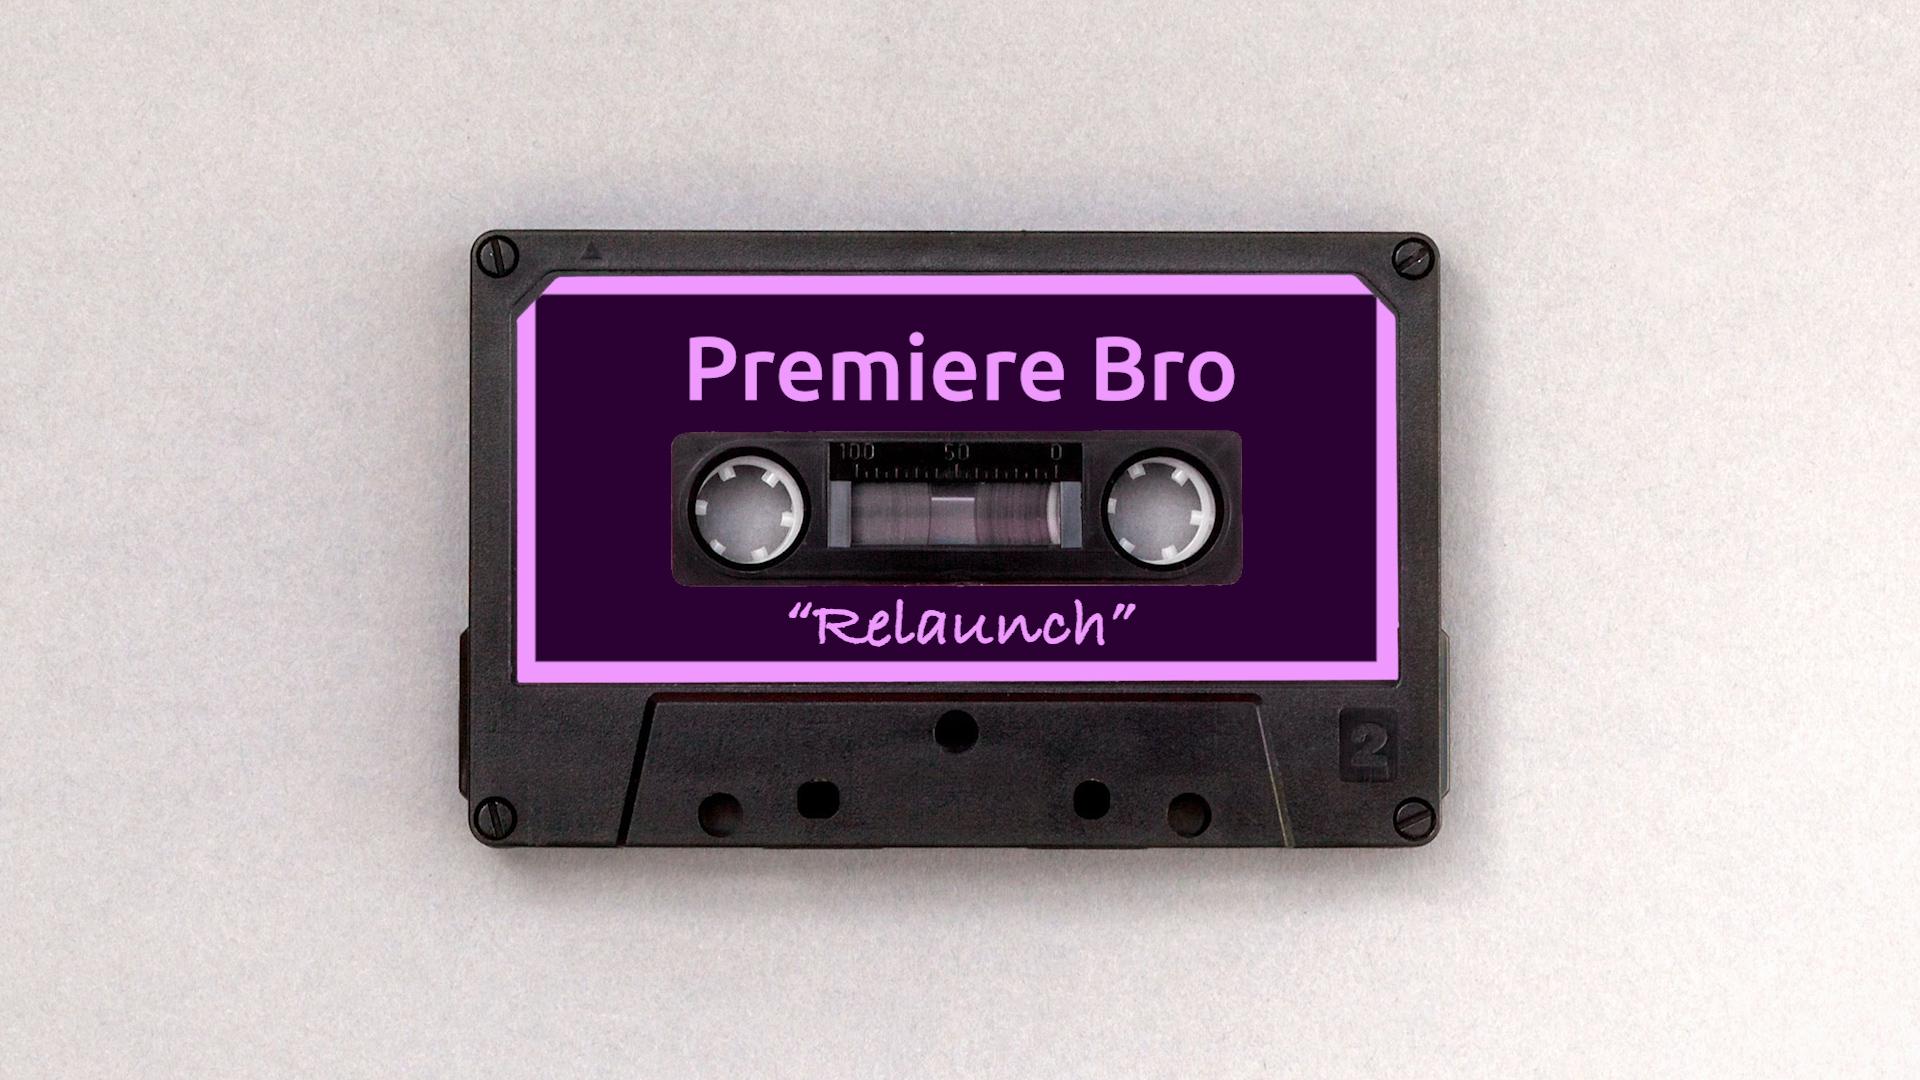 premiere-bro-relaunch.jpg